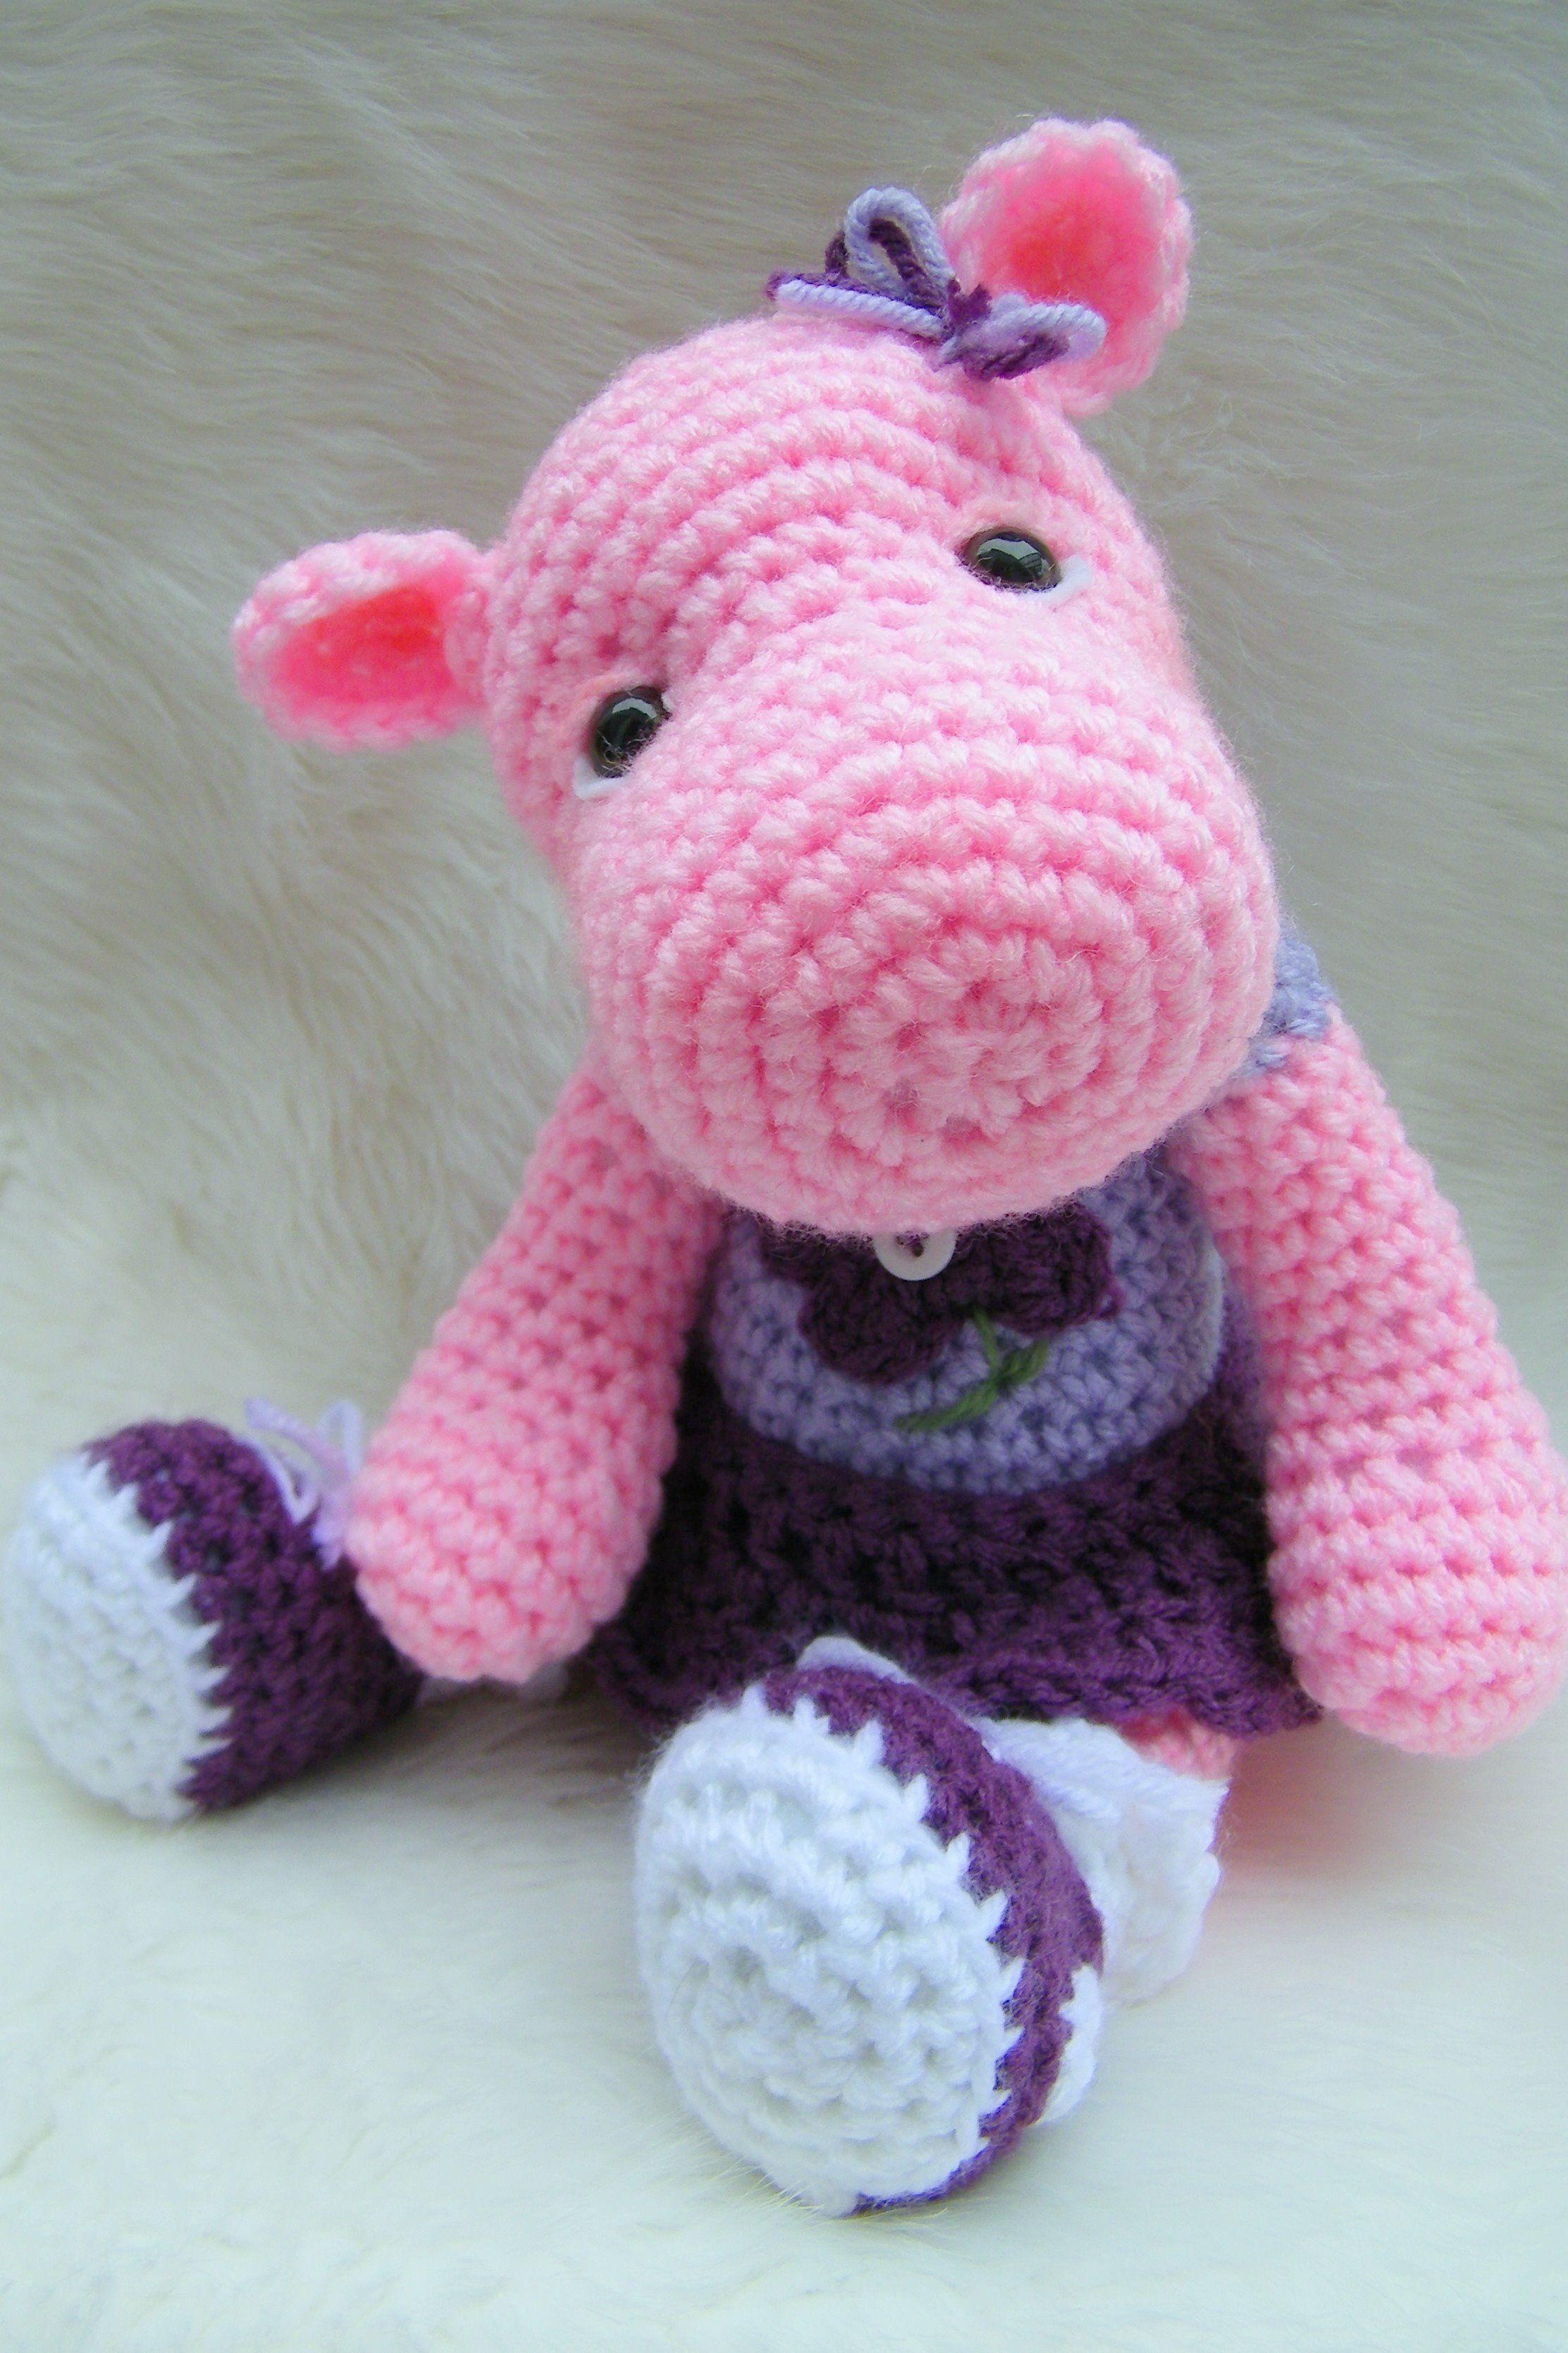 Simply Cute Hippo pattern by Teri Crews | Crochet Amurgurmie & other